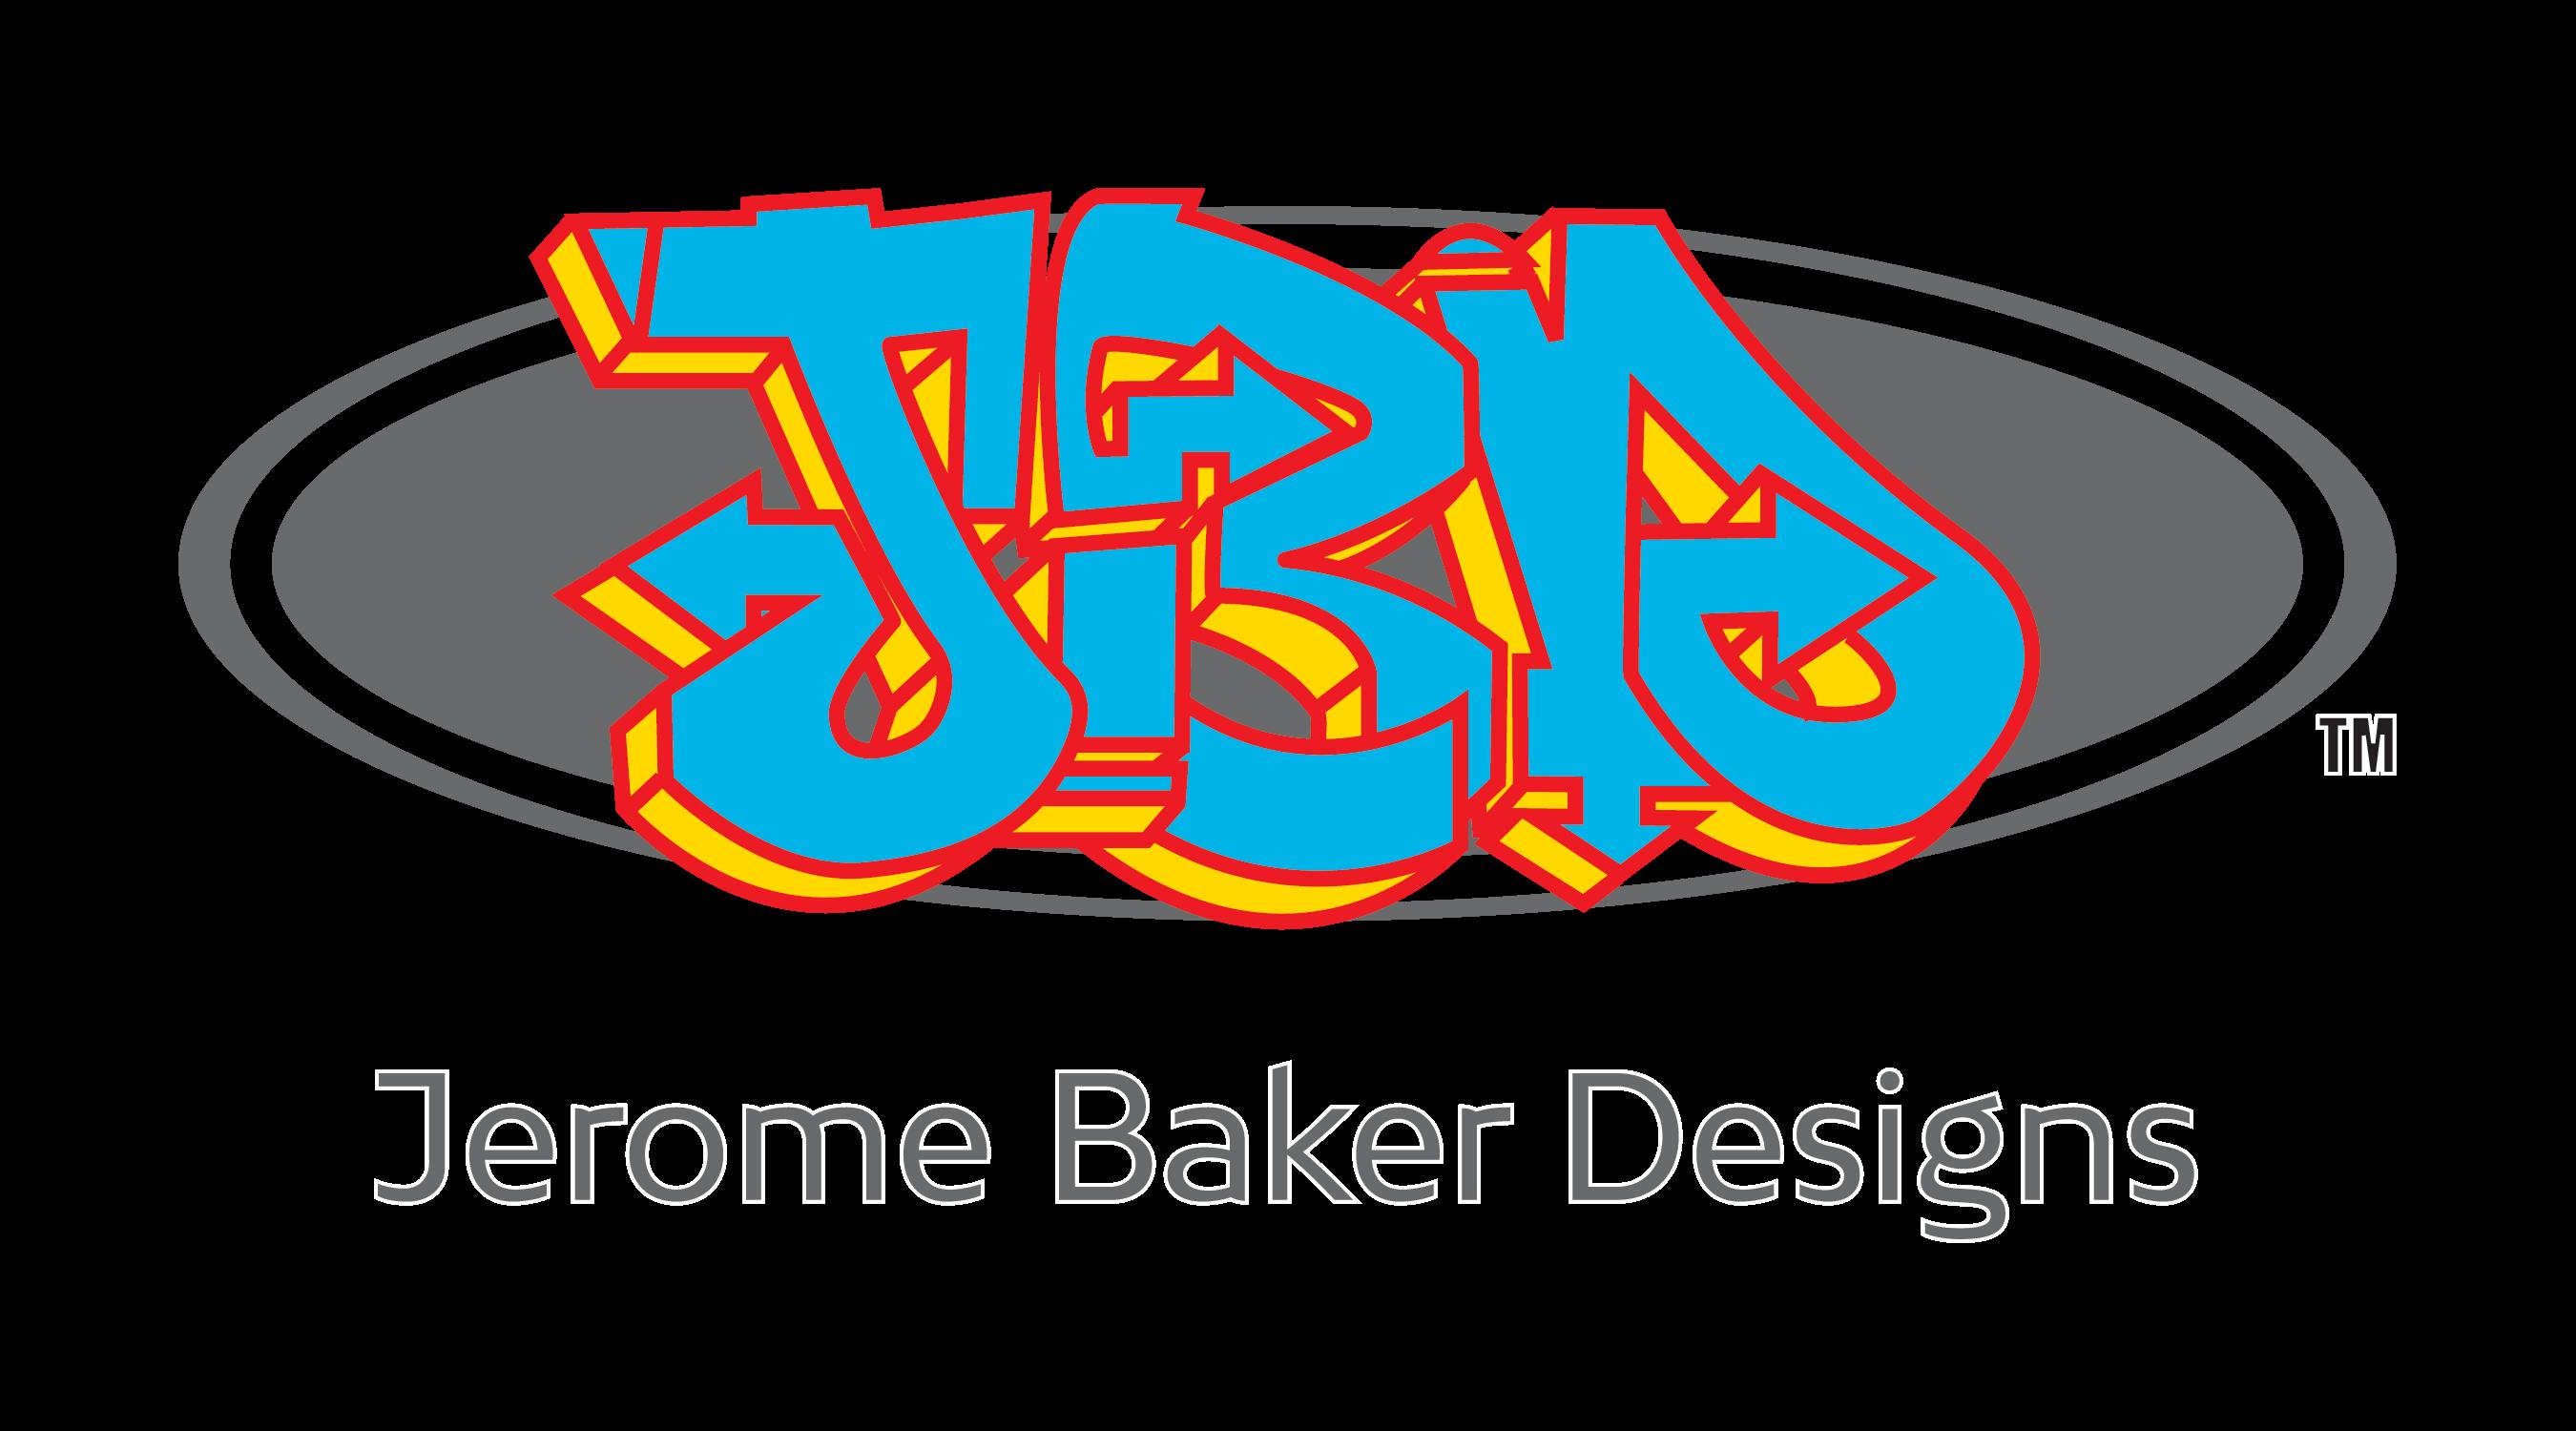 Jerome Baker Designs logo